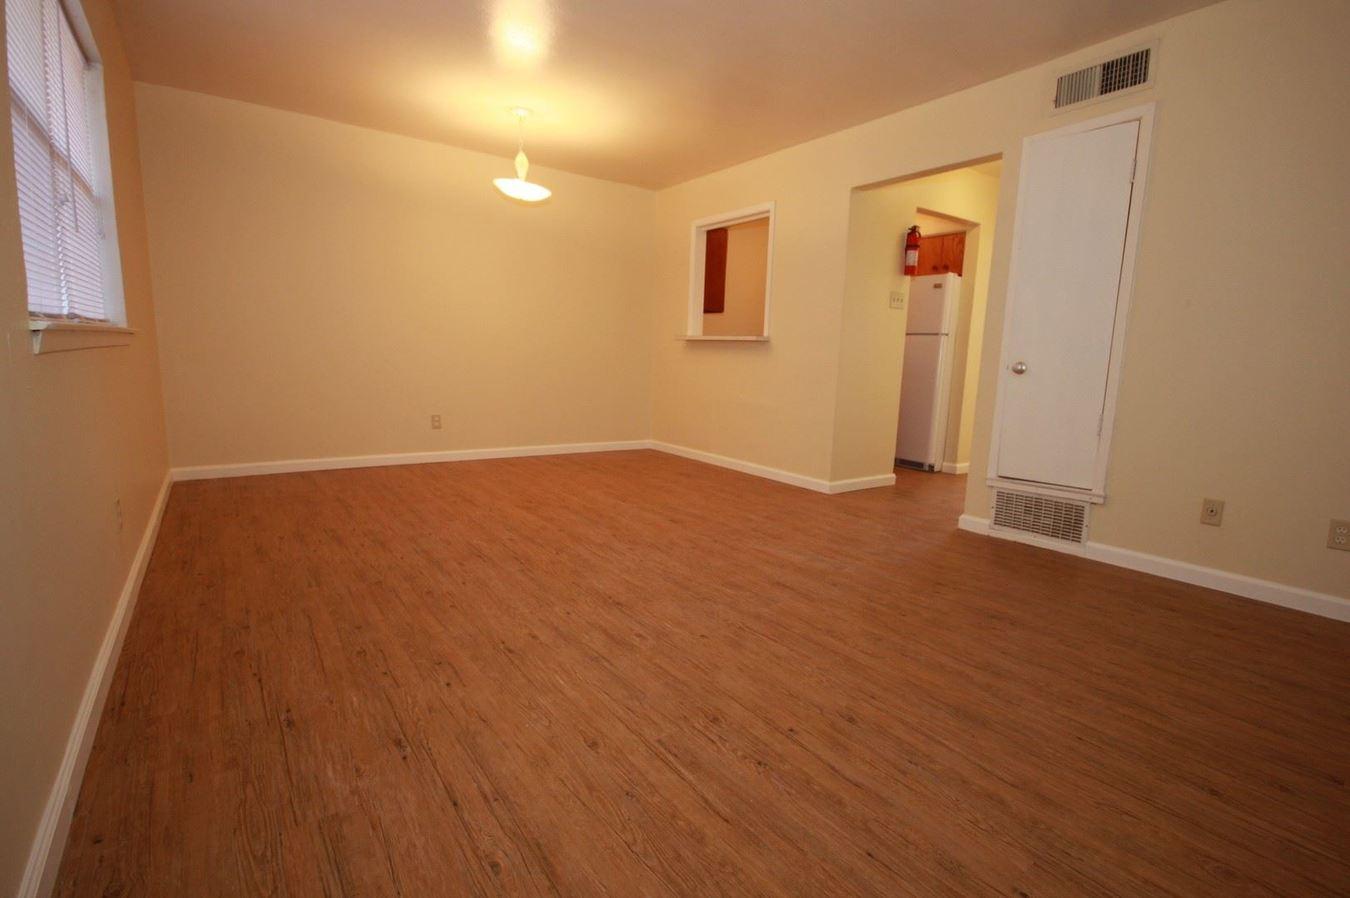 1 Bedroom 1 Bathroom Apartment for rent at 113 Andrews in San Antonio, TX